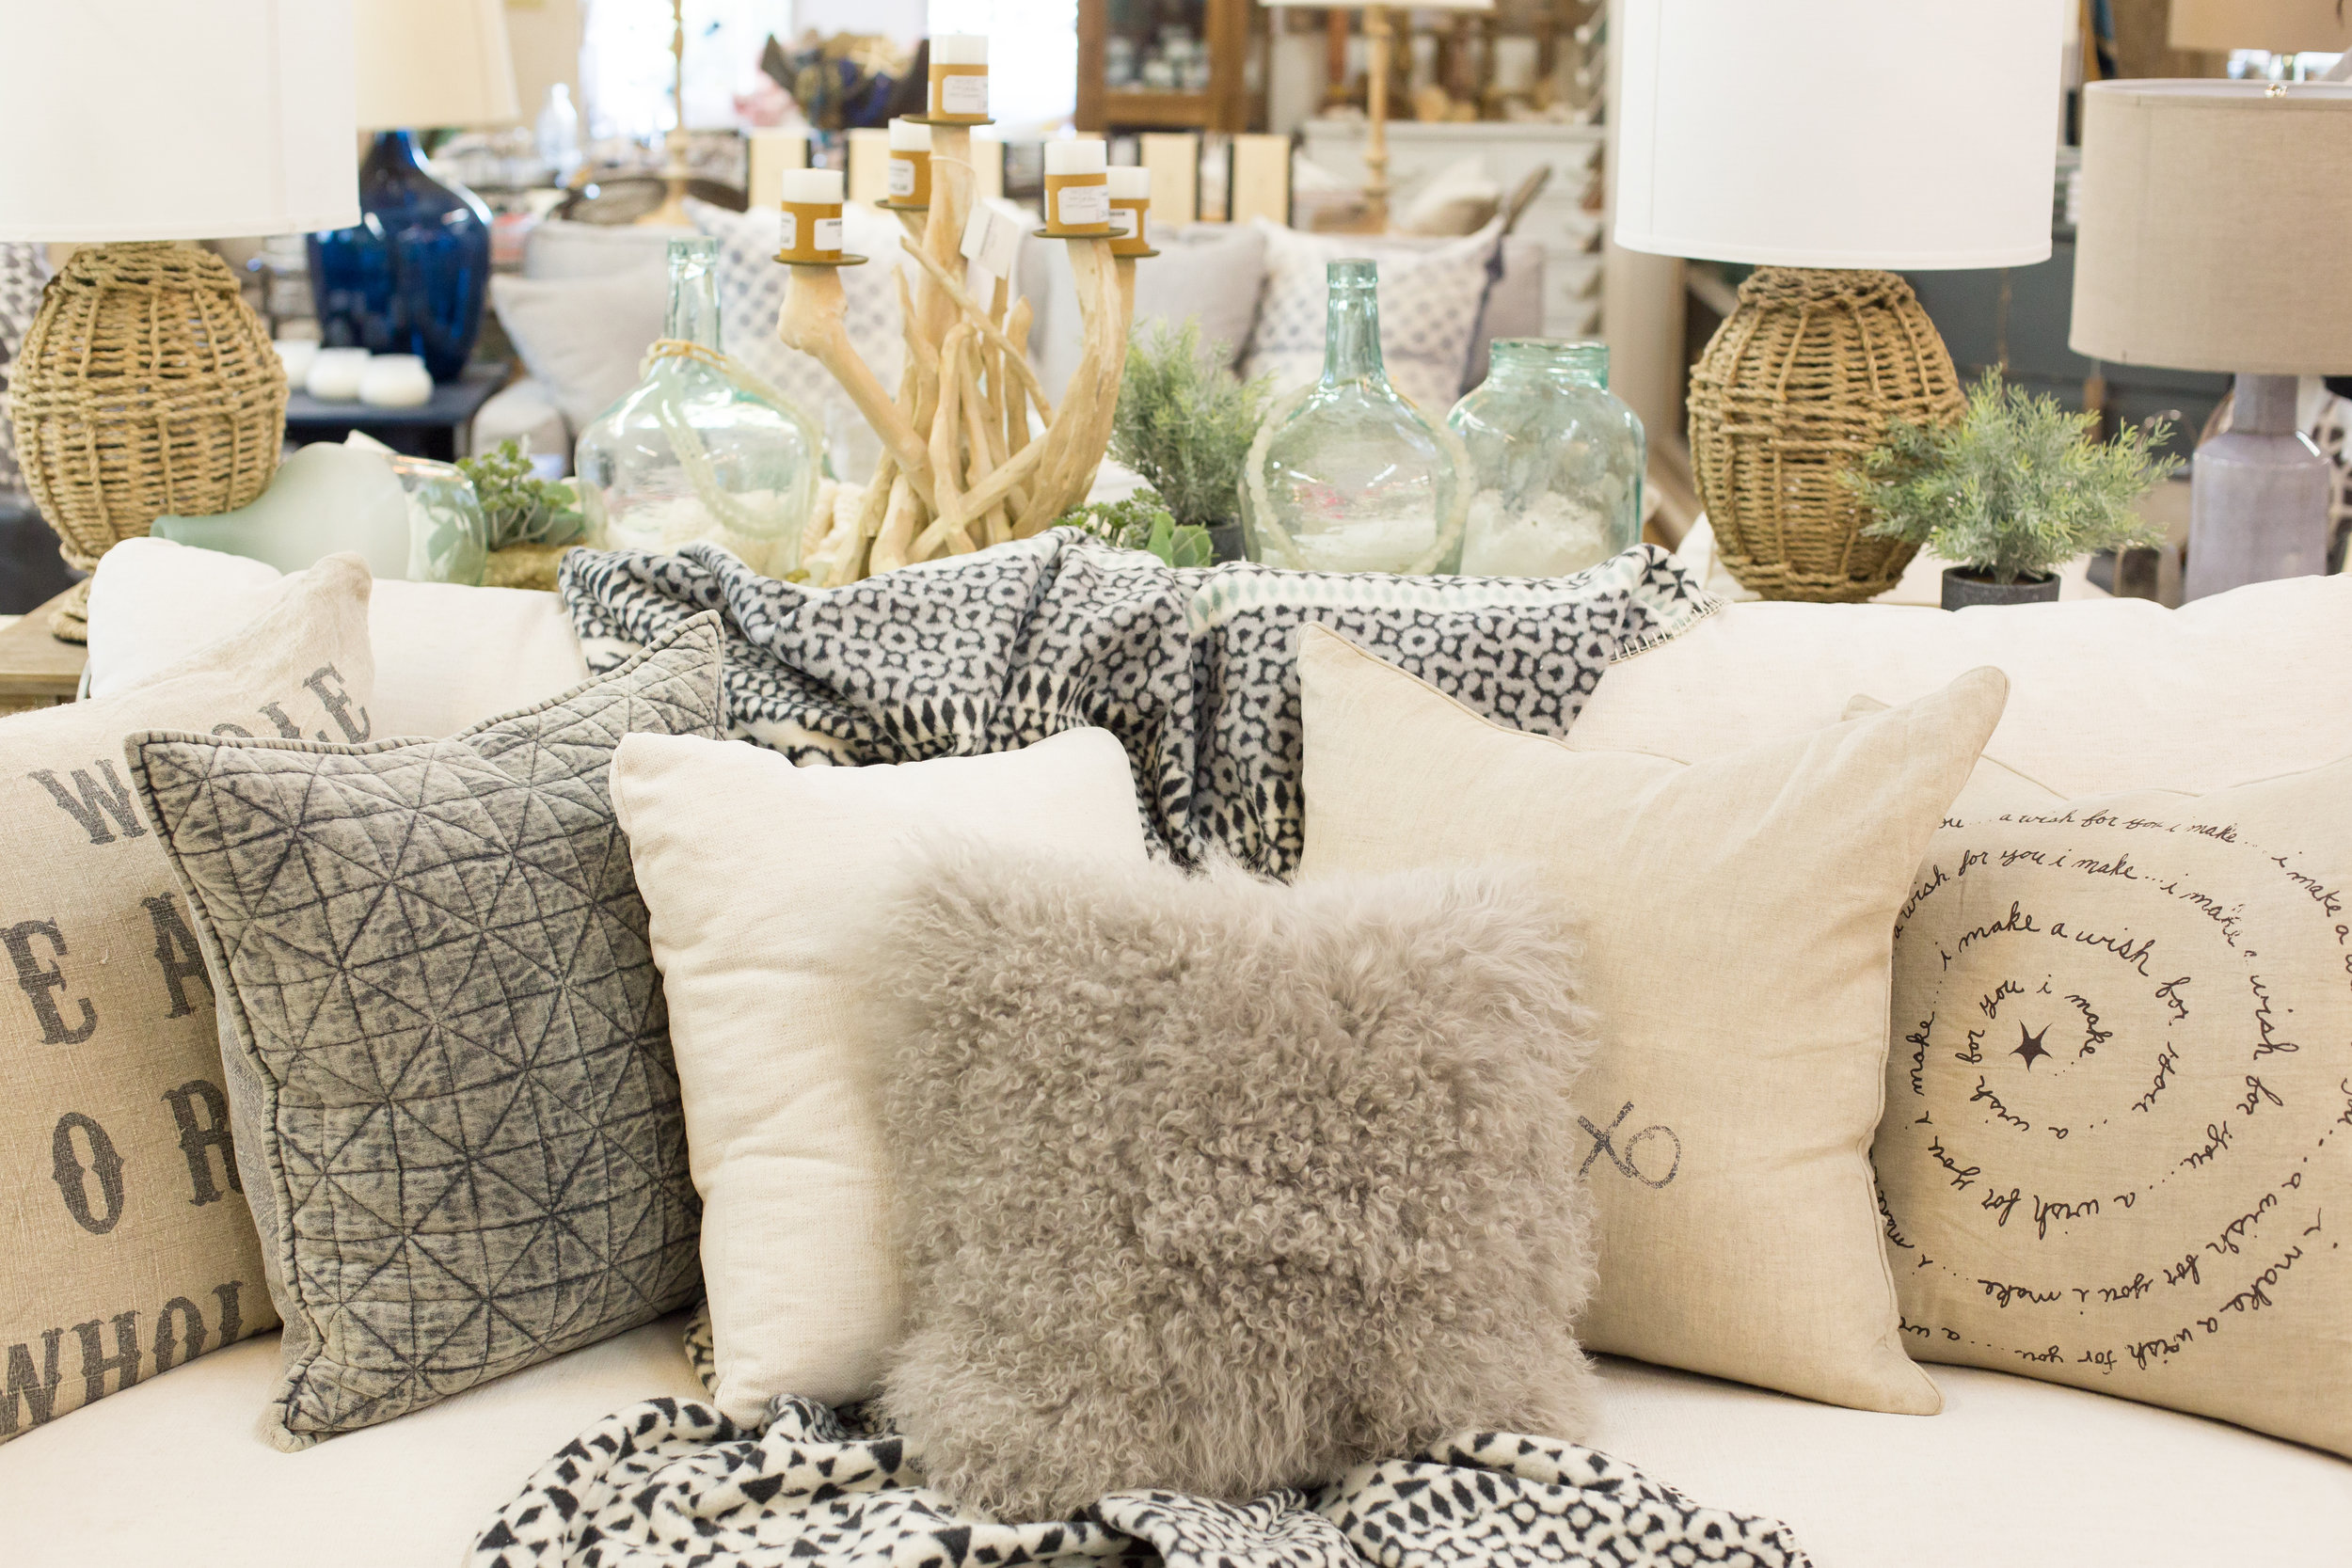 Boutique sofa, stylish pillows